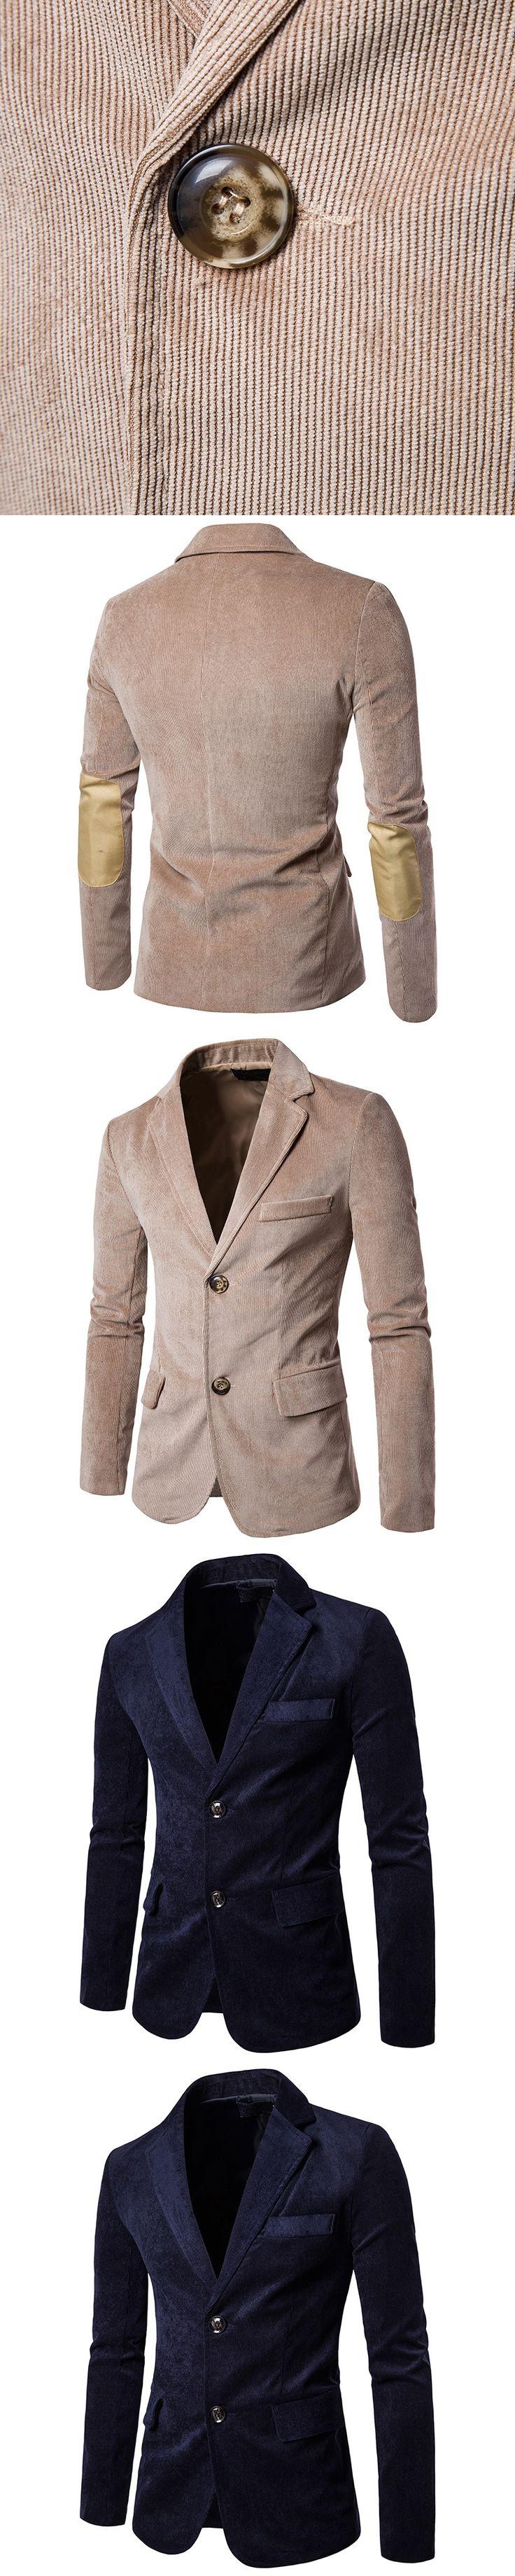 Mens Corduroy Blazers 2017 Casual Patchwork Blazer Hombre Single Breasted Male Suit Jacket Autumn Slim Fit Mens Blazers M~2XL